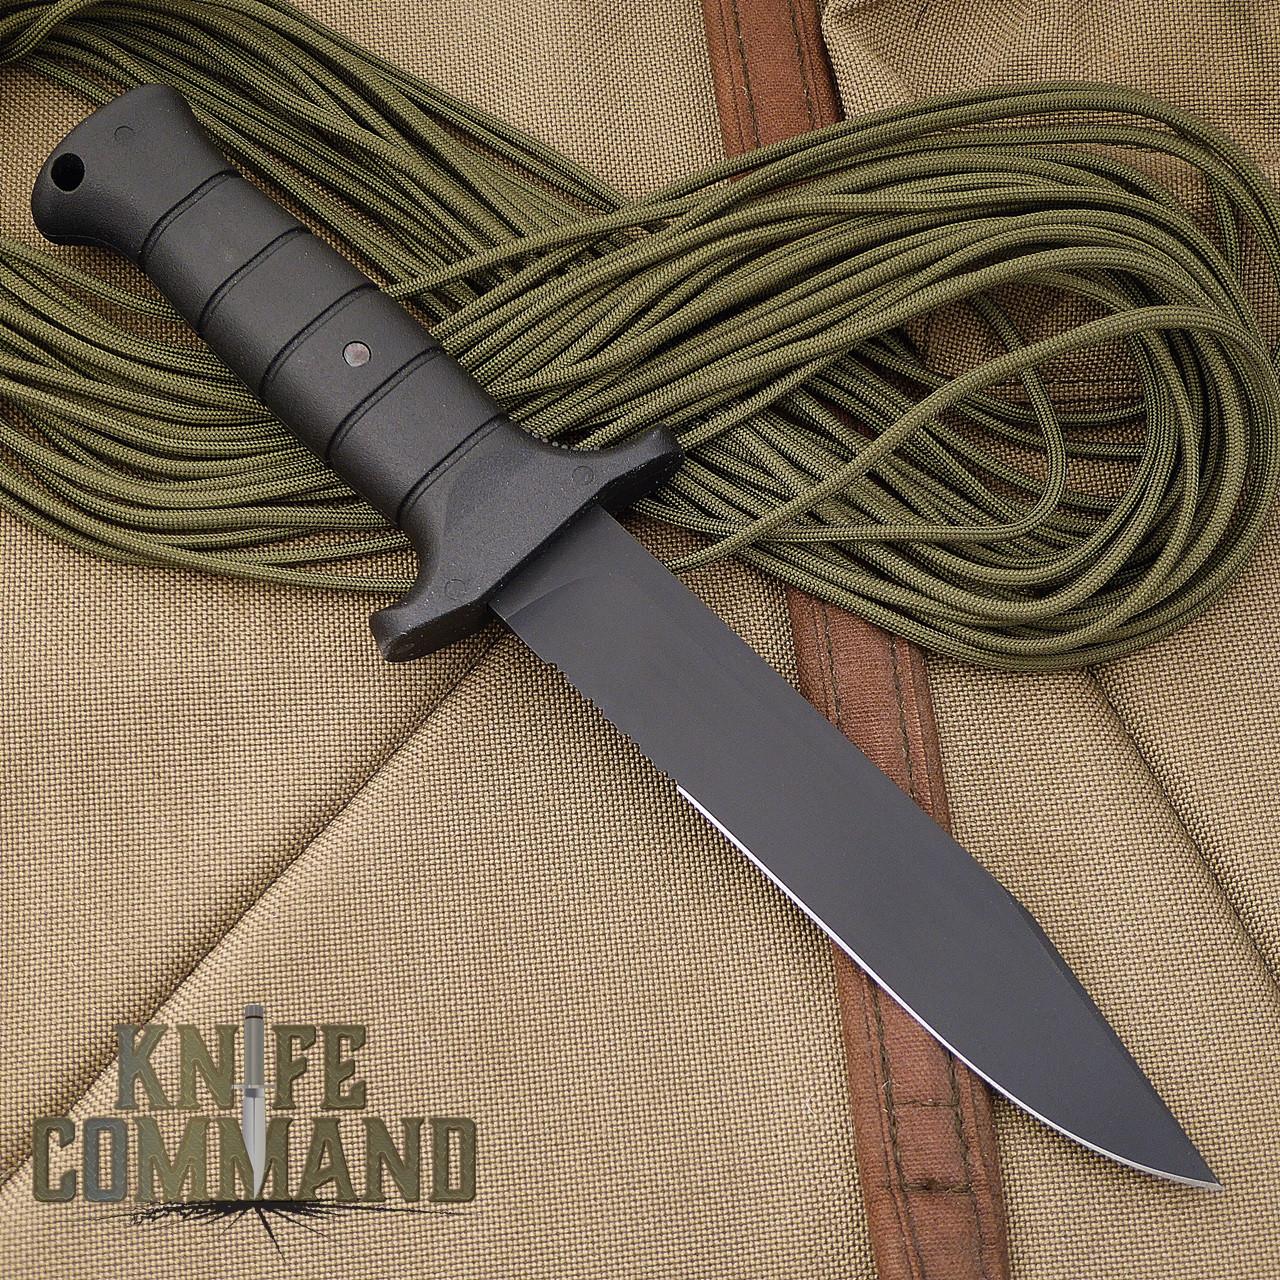 Eickhorn Solingen Wolverine German Expedition Knife. Clip point bowie hunter.